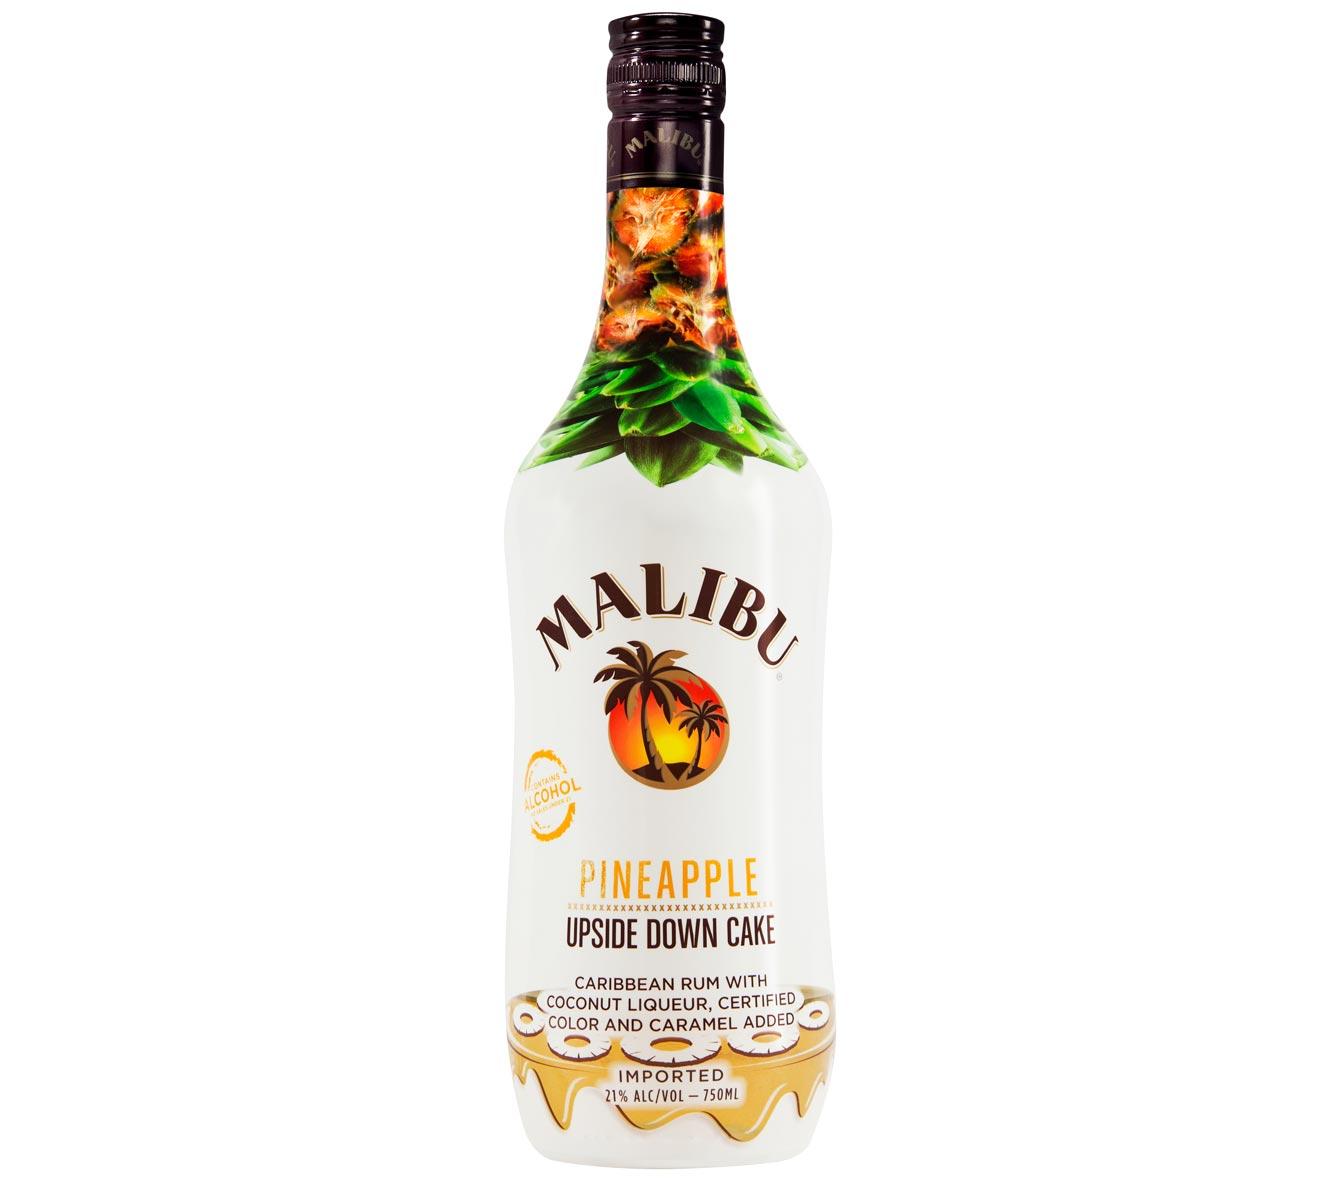 Review: Malibu Pineapple Upside Down Cake Rum